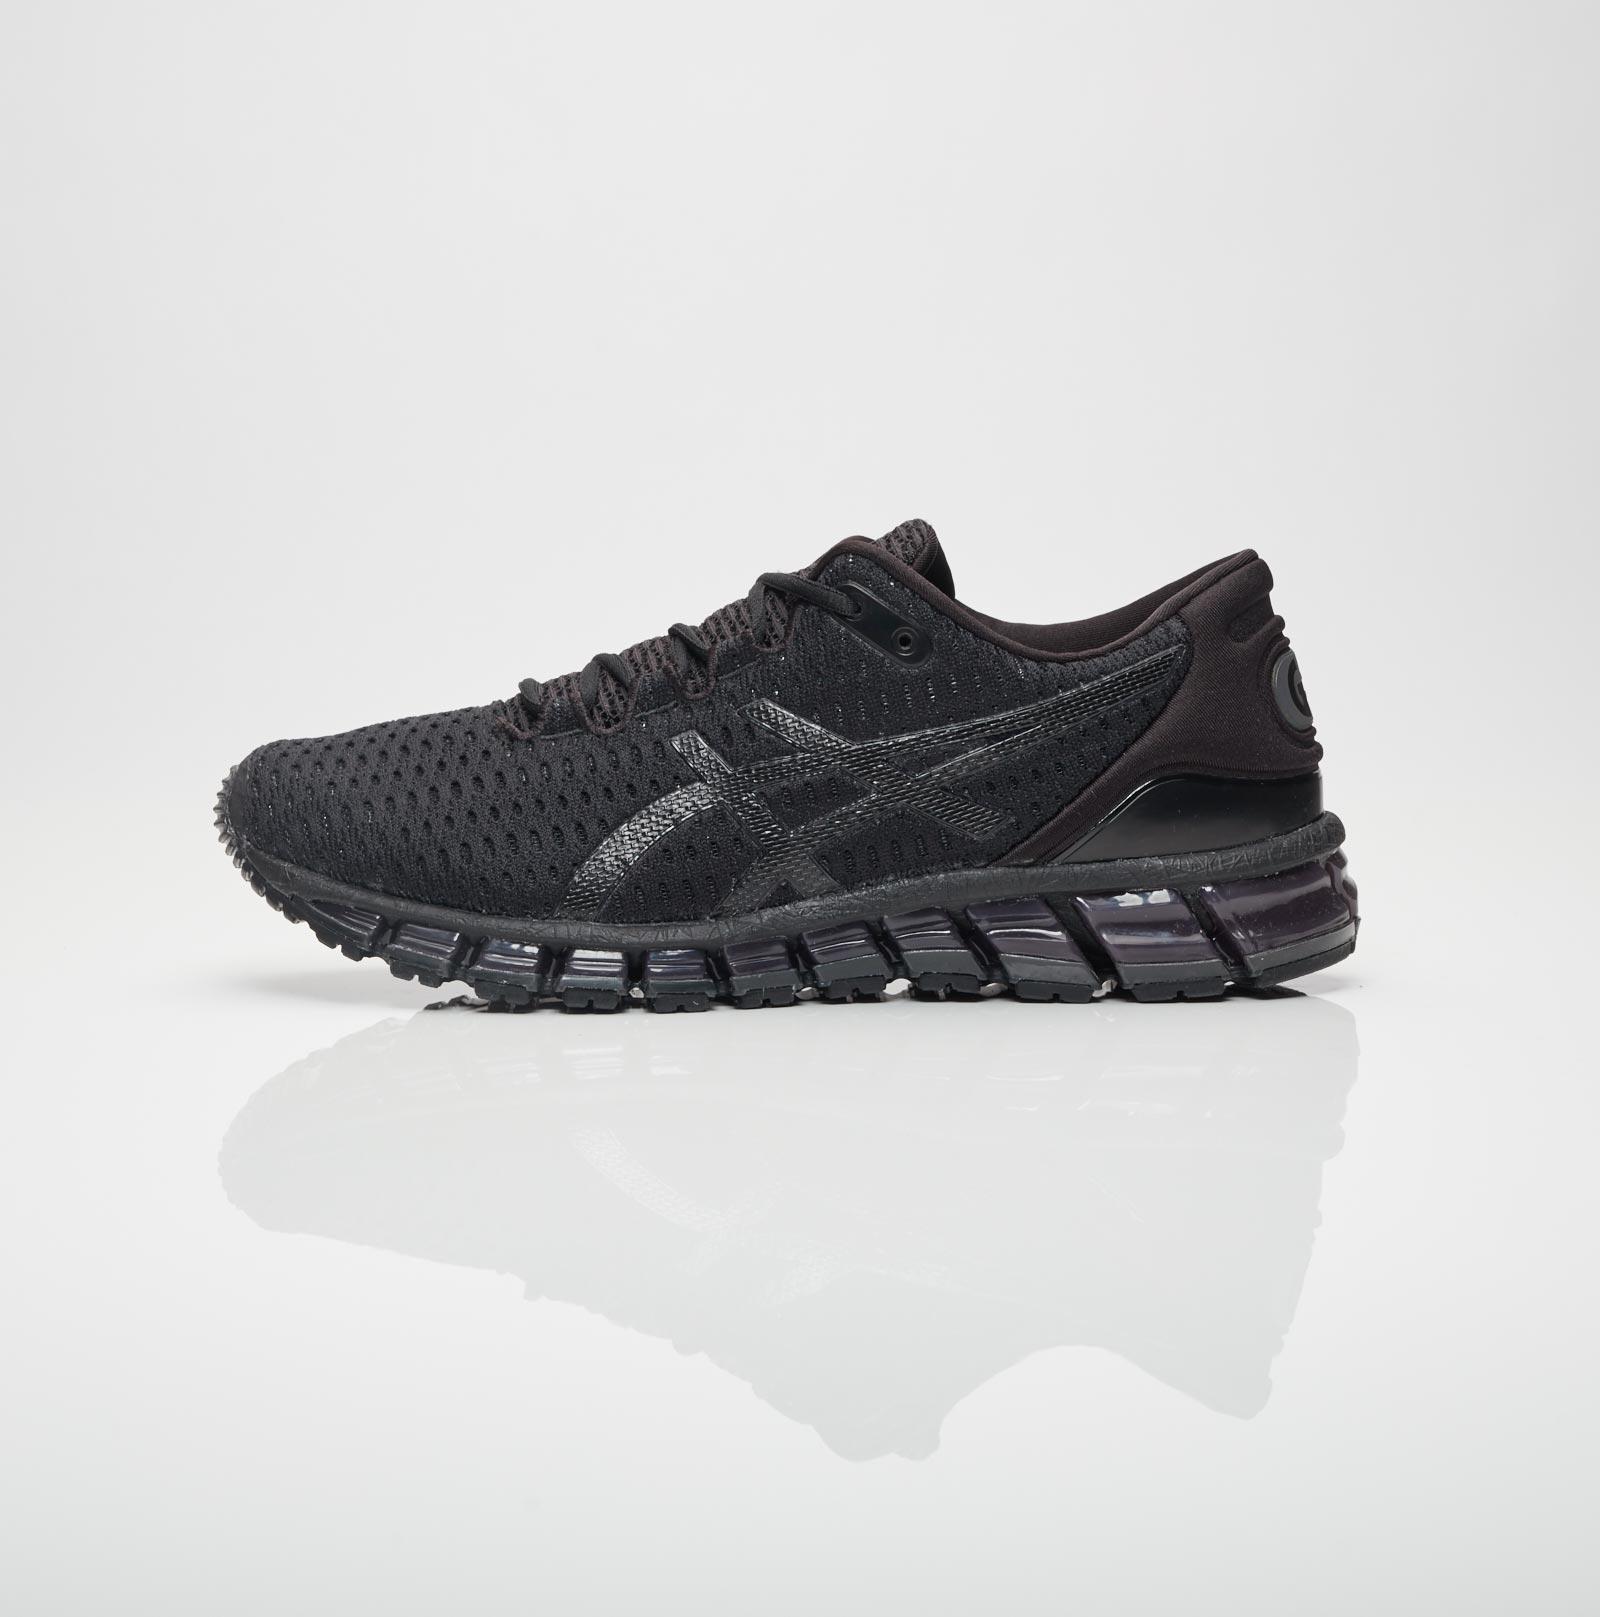 half off b364a 2653d ASICS Tiger Gel-Quantum 360 Shift ST - T7e2n-9090 - Sneakersnstuff    sneakers   streetwear online since 1999